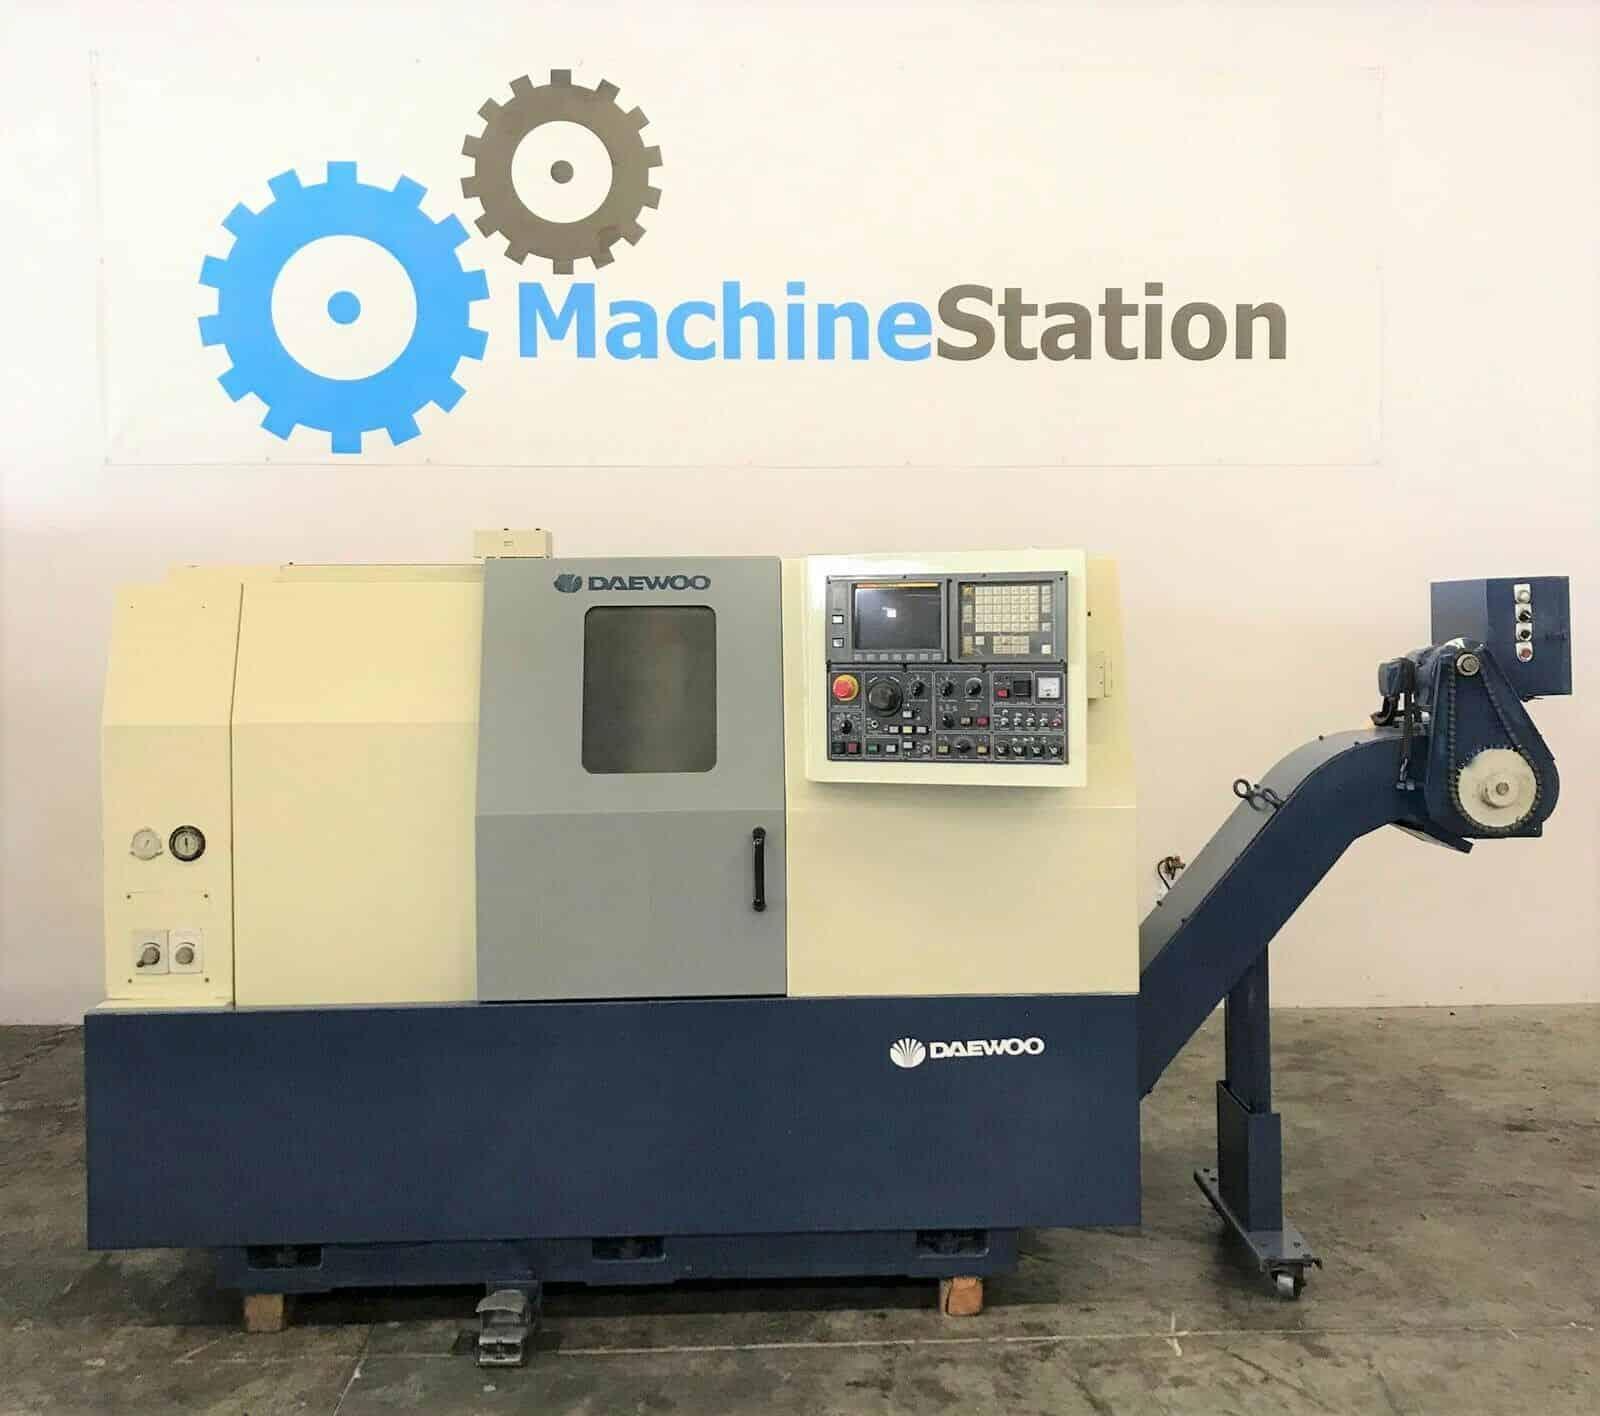 judío Pantano suficiente  Daewoo Puma 8S CNC Turning Center - MachineStation